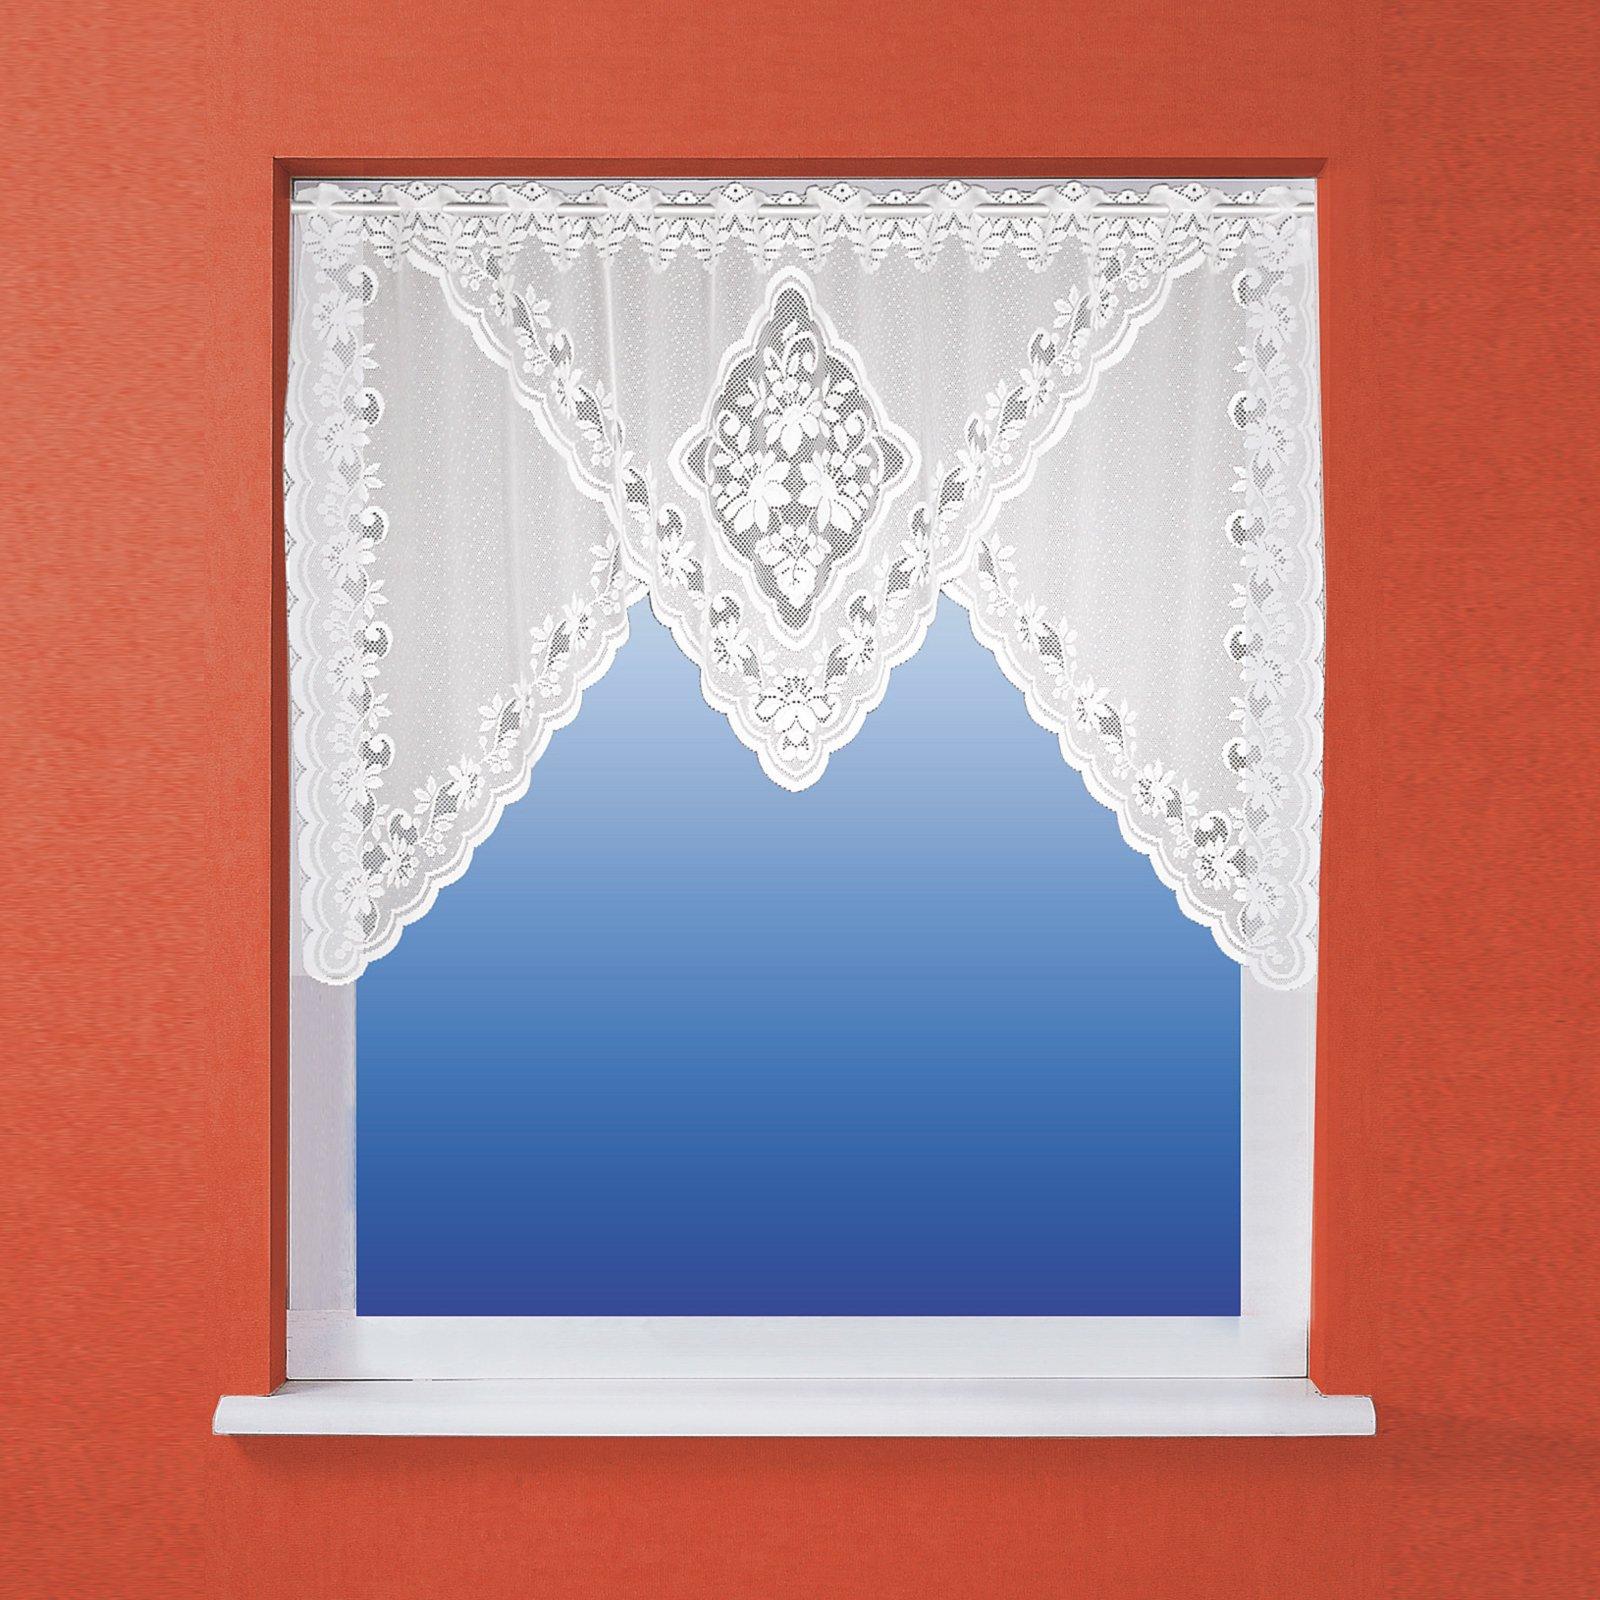 Gardine - Bogen Panneaux - 140x50 cm